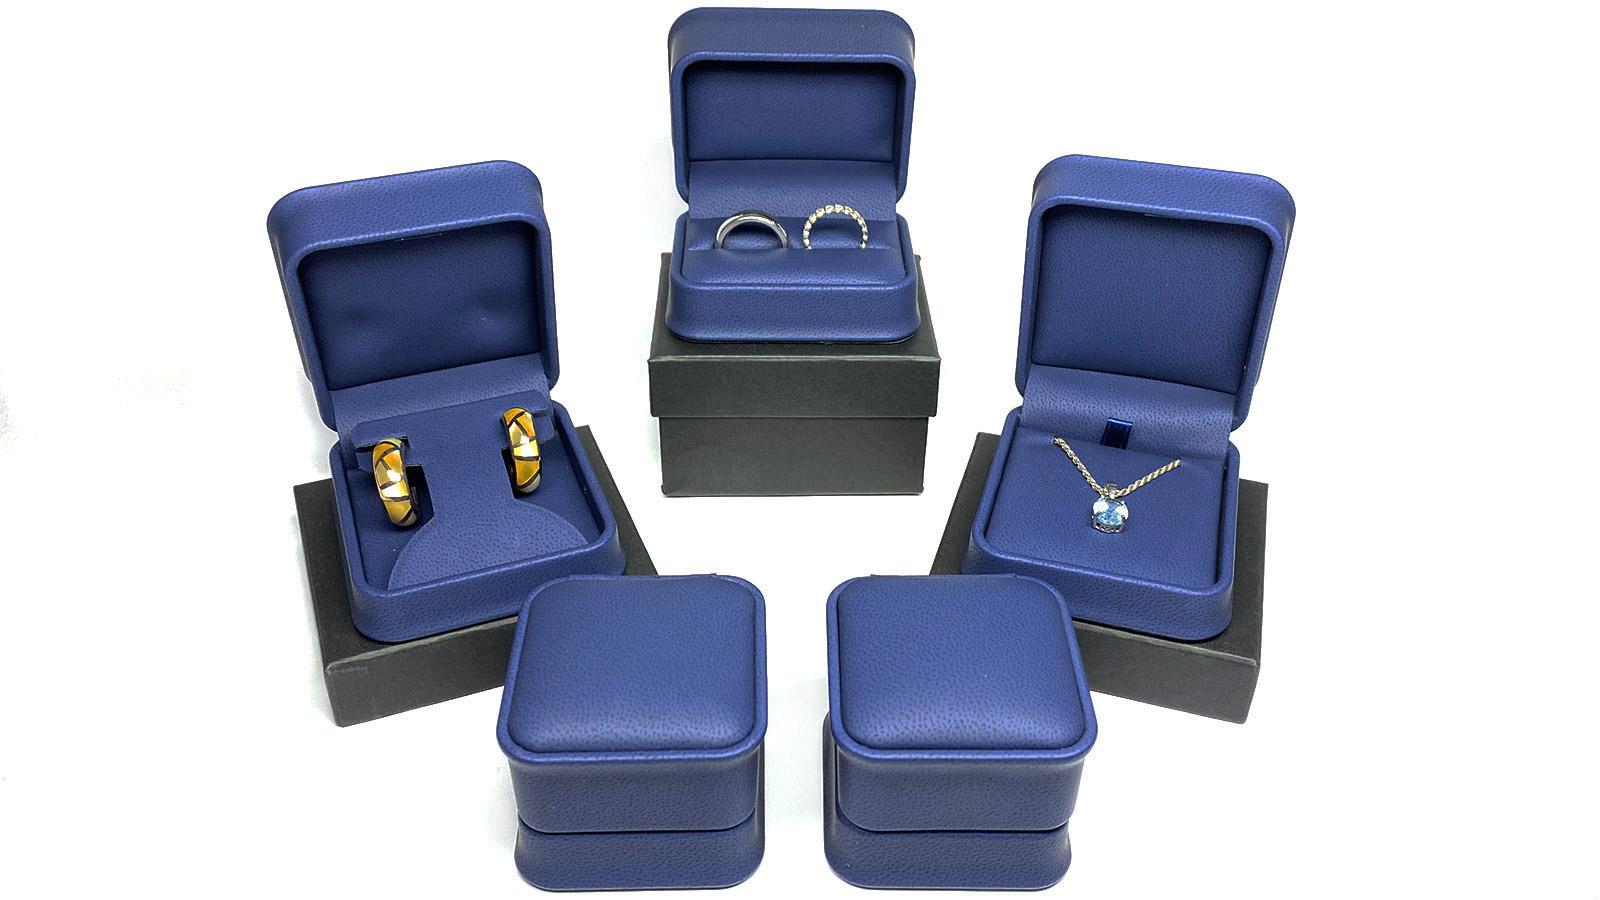 plush-blue-faux-leather-boxes-group-shot-1600-5.jpg